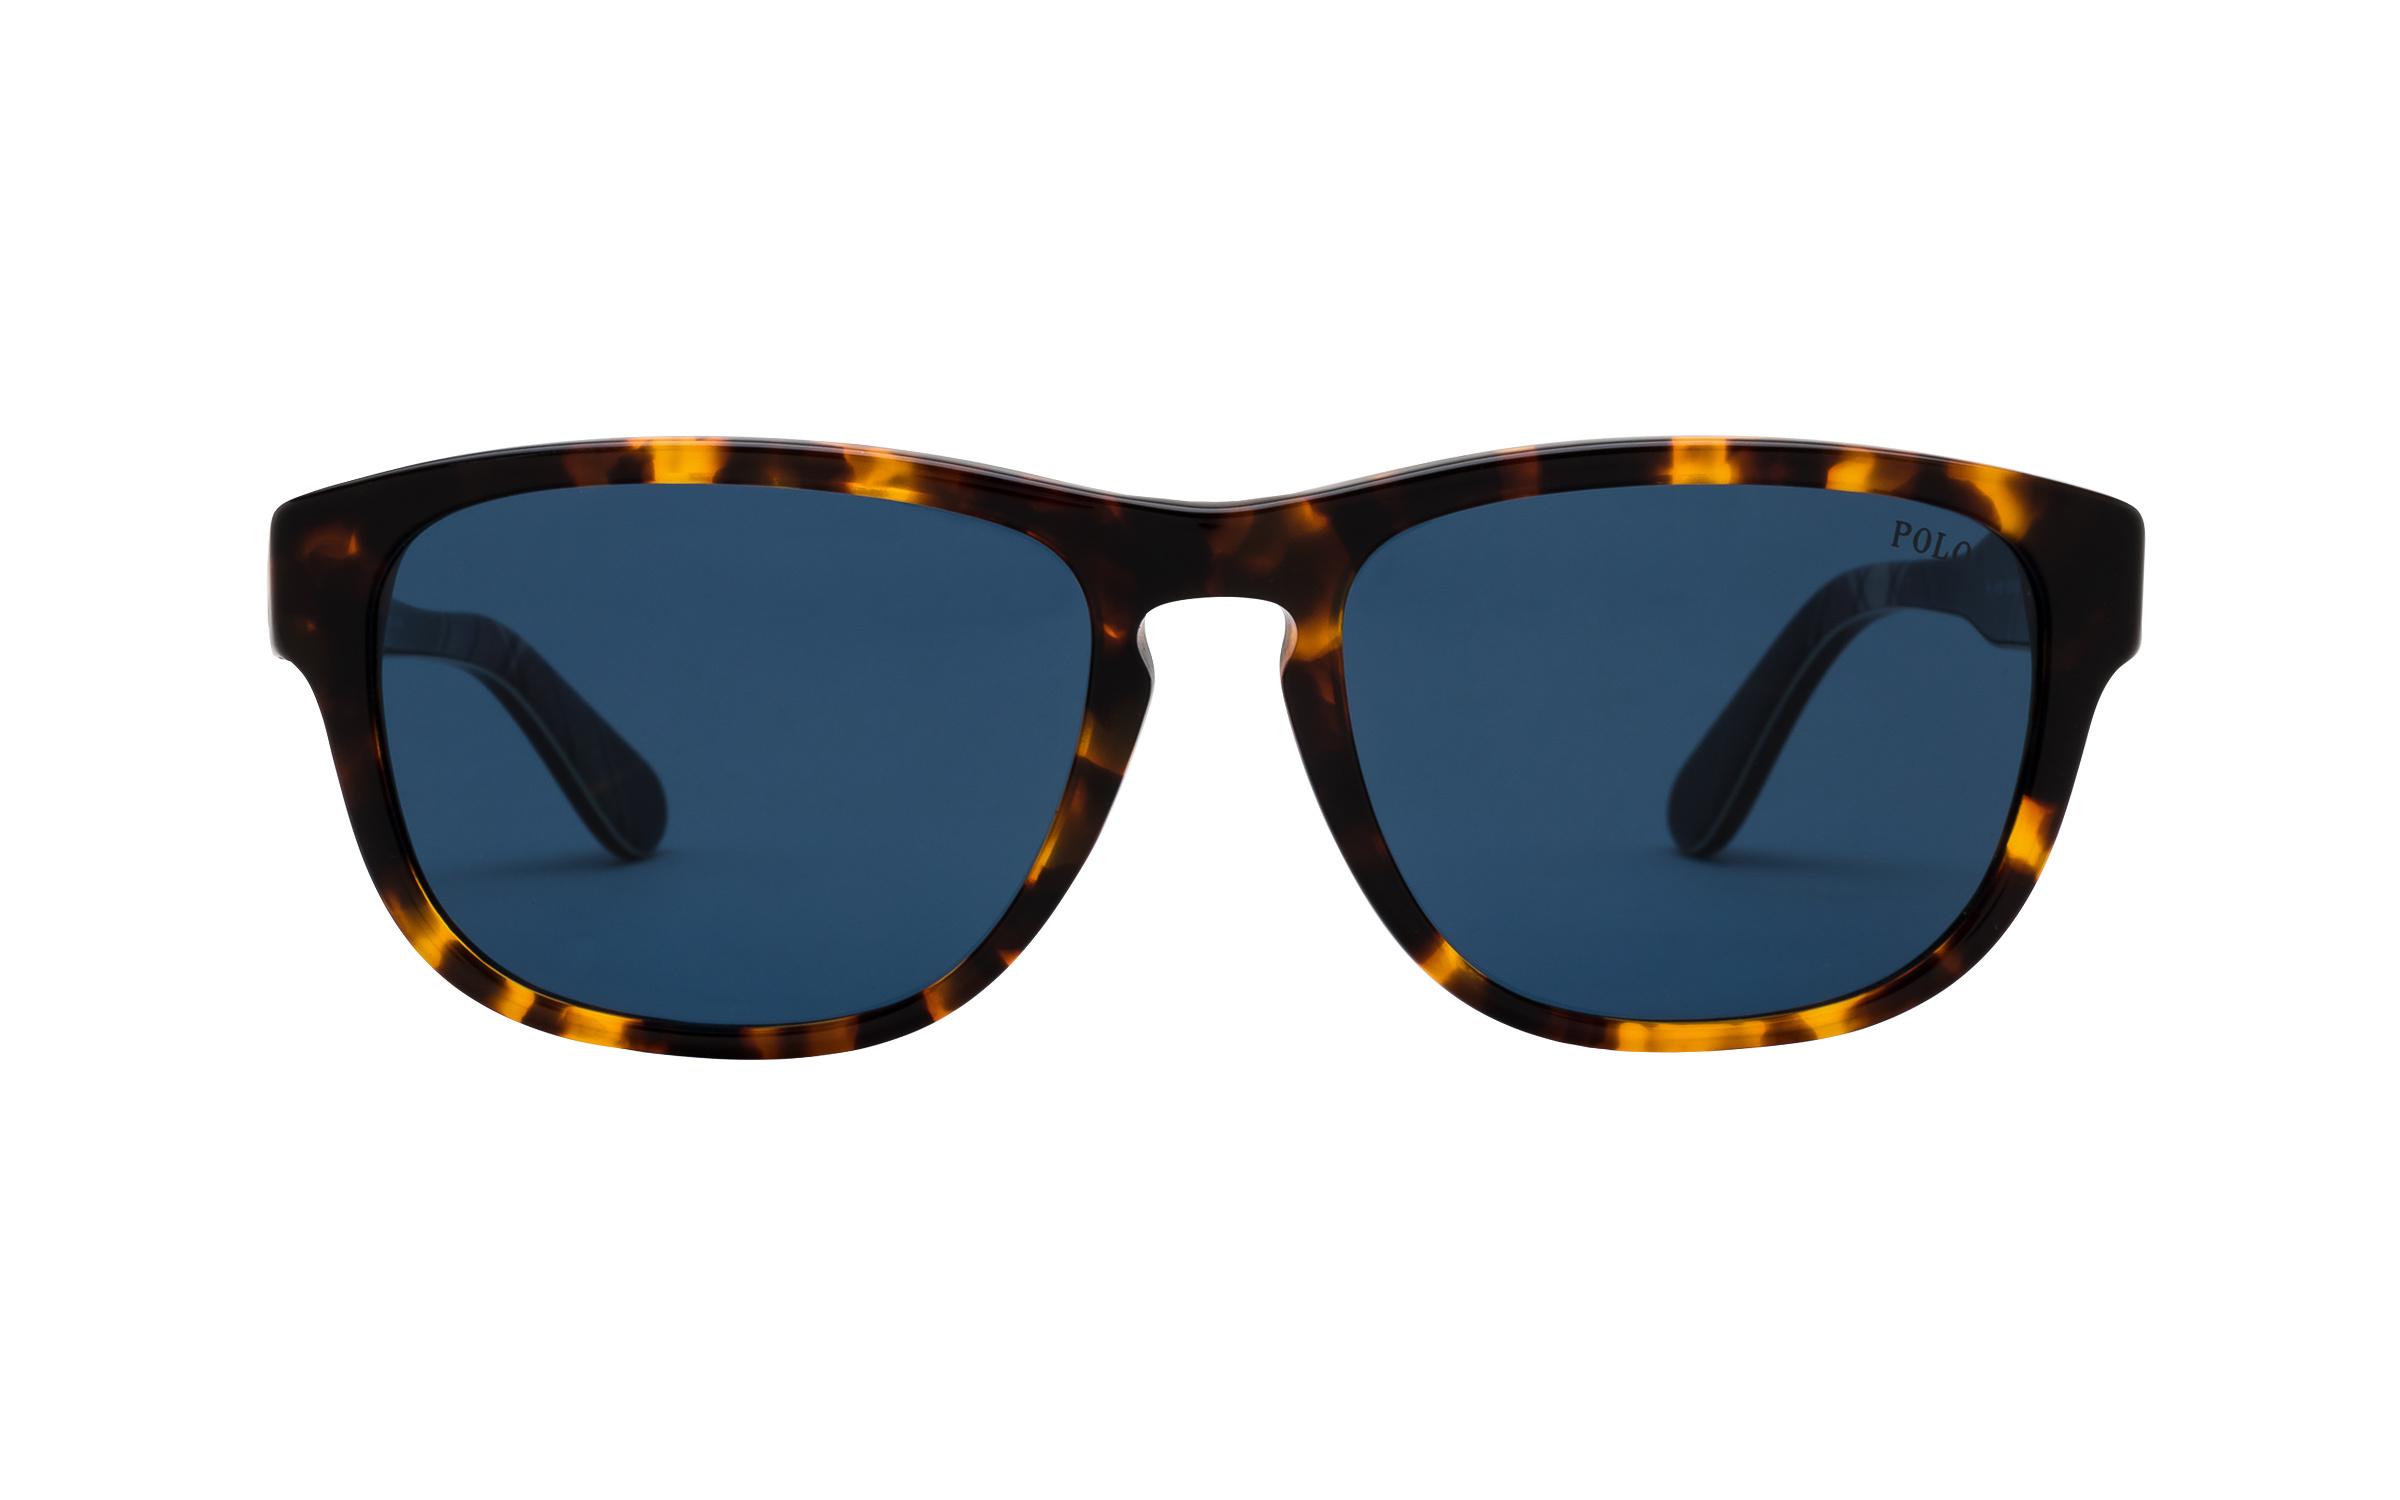 http://www.coastal.com/ - Luxottica Polo Ralph Lauren PH4158 513480 55 Sunglasses in Antique Tortoise | Acetate – Online Coastal